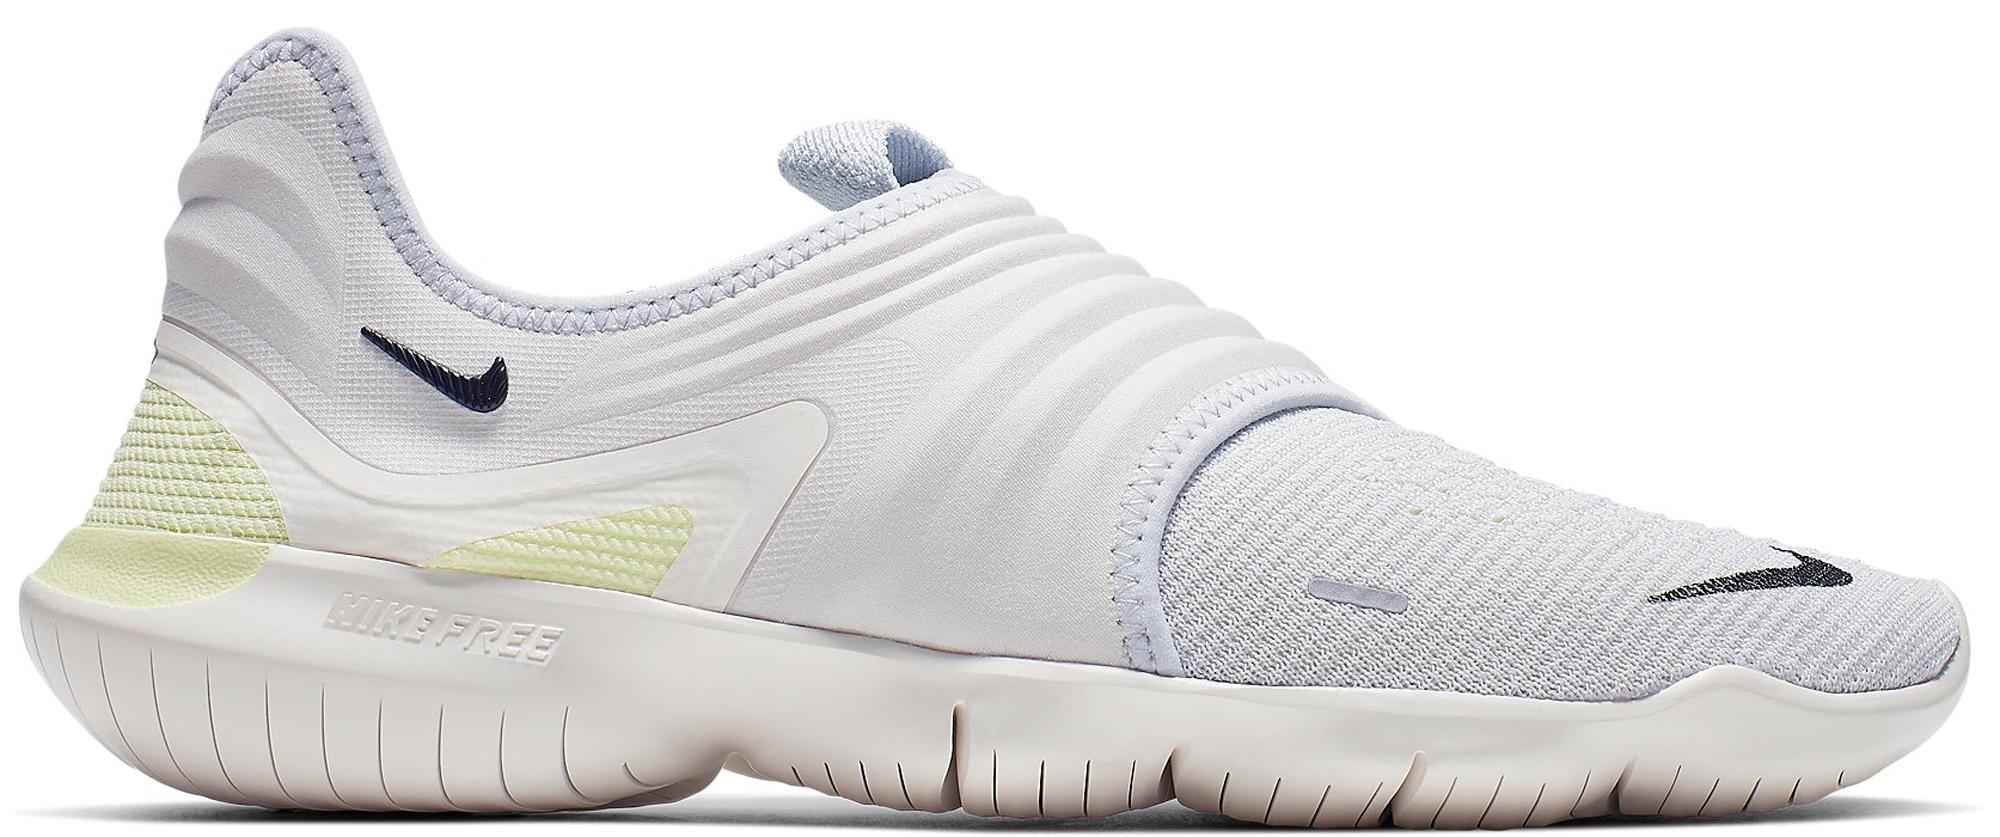 Nike Free RN Flyknit 3.0 Pure Platinum